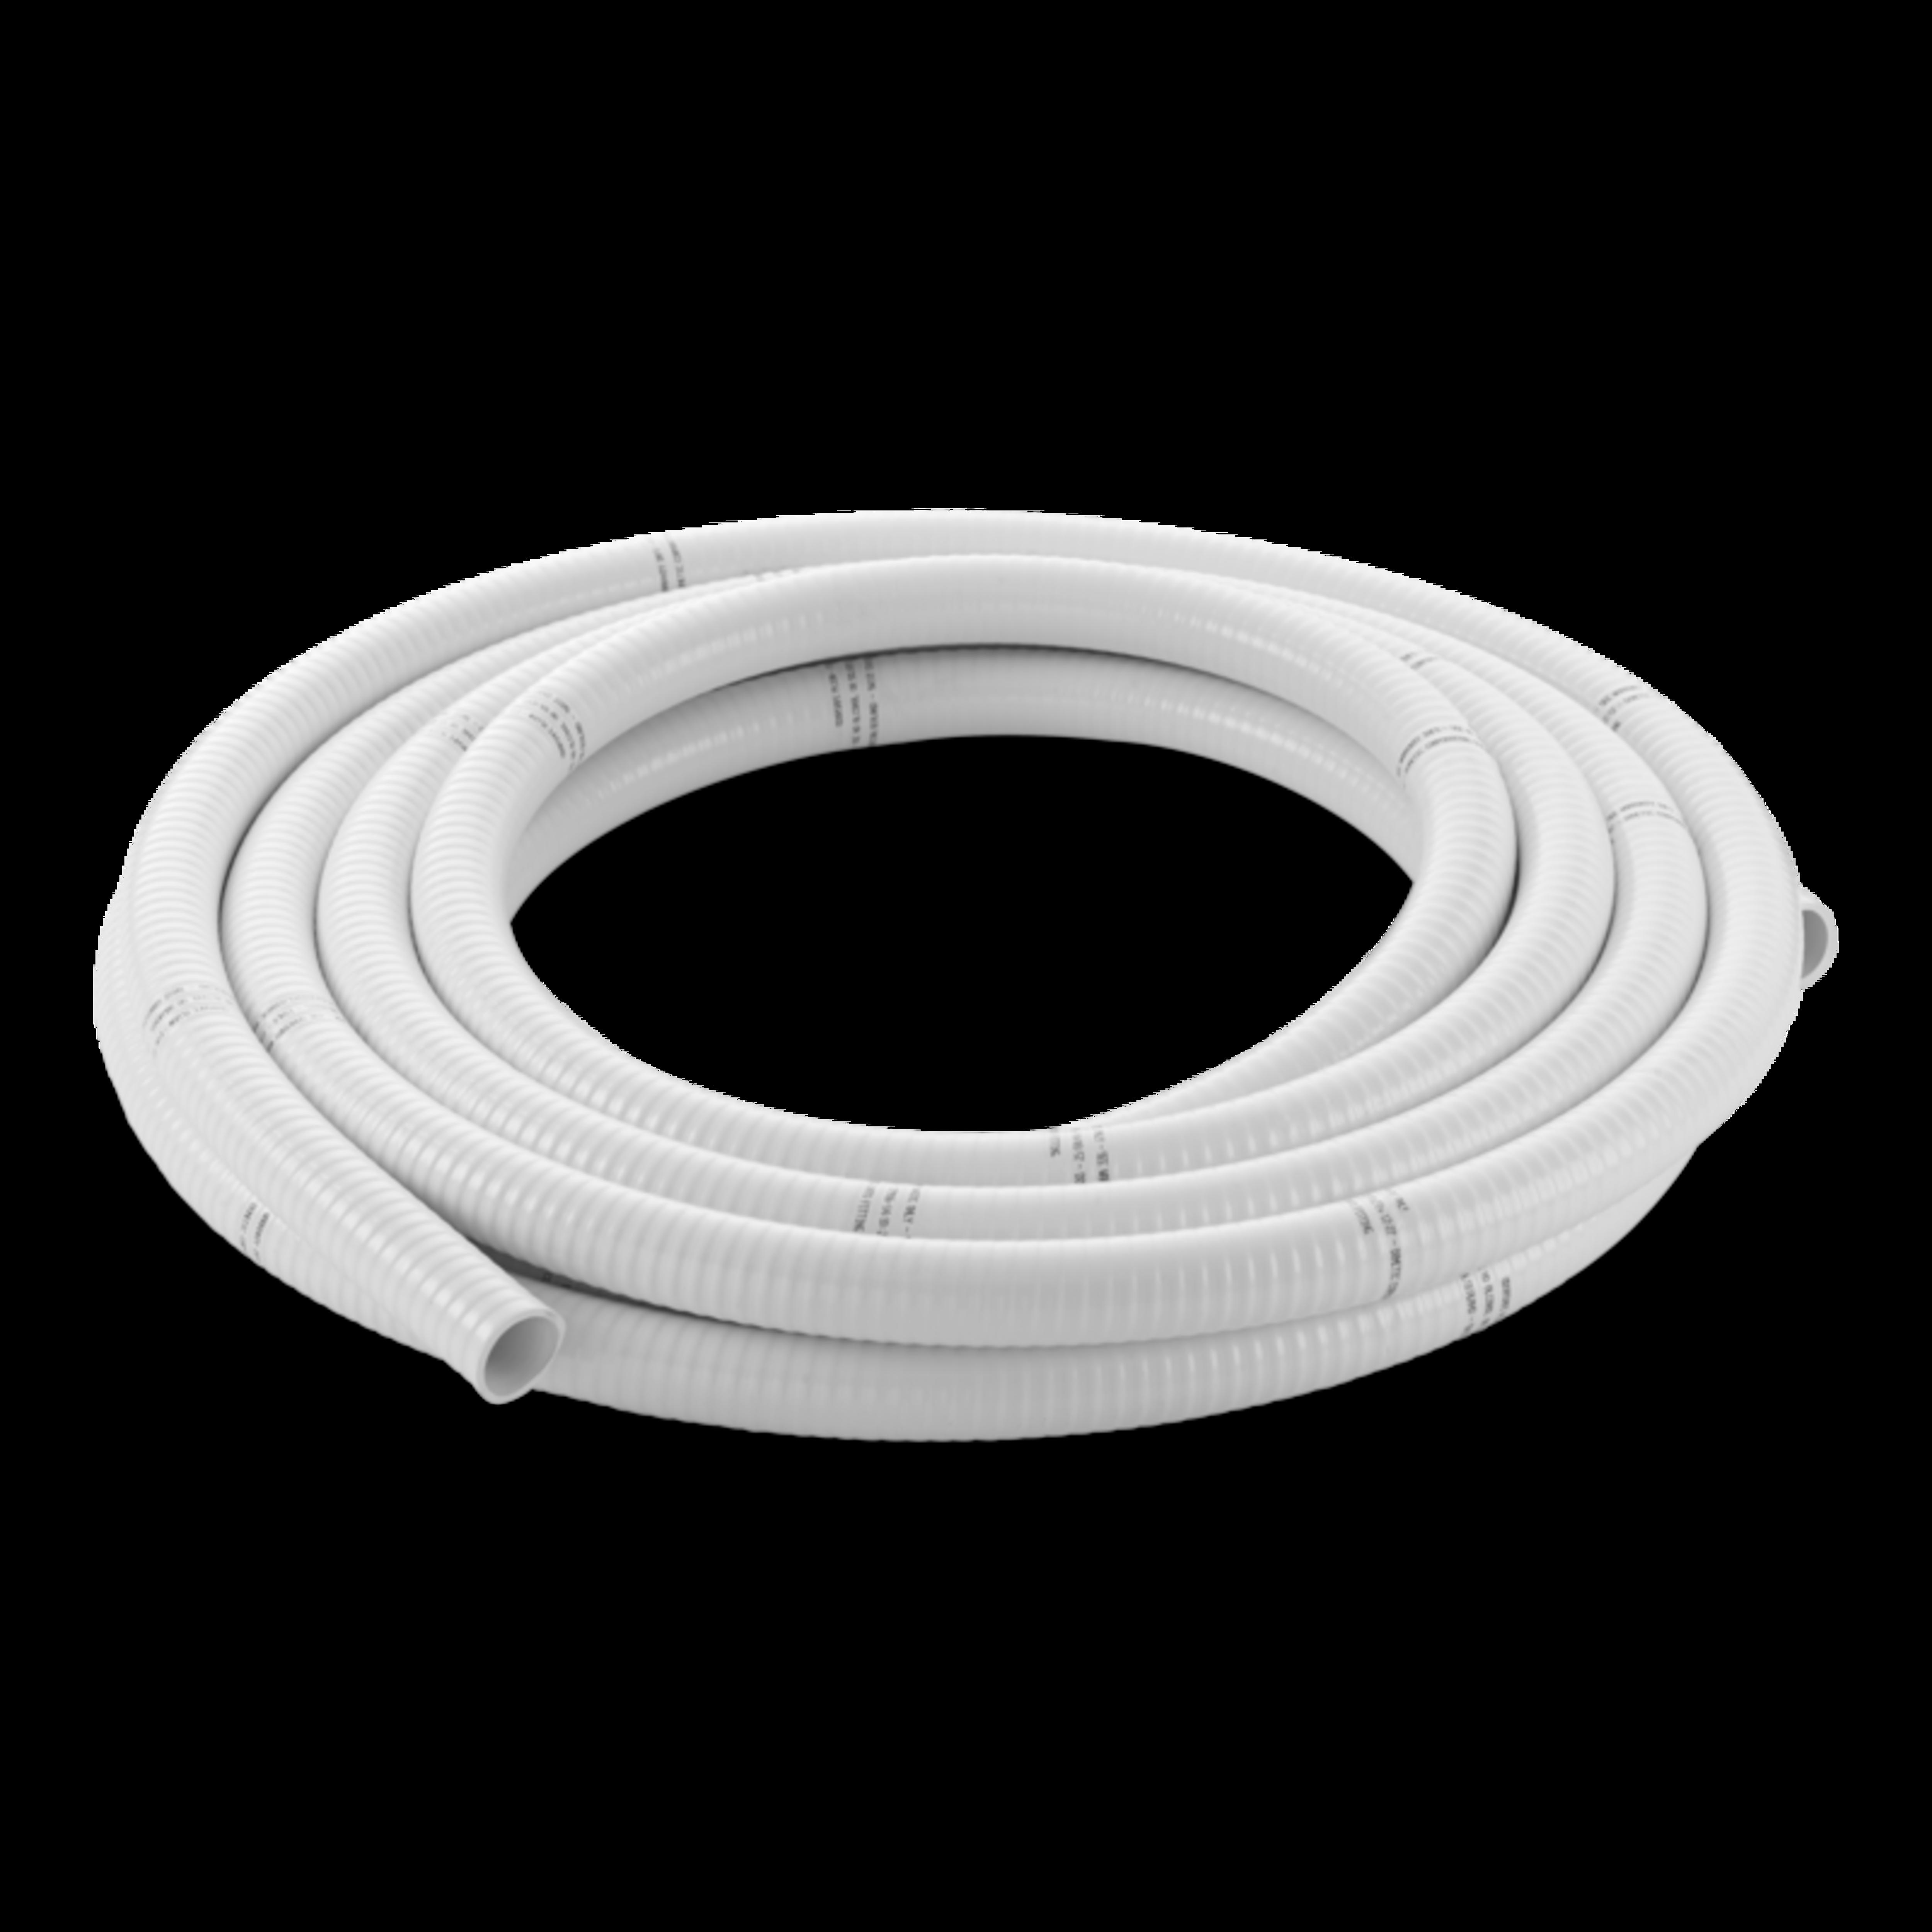 Dometic OdorSafe Plus 38